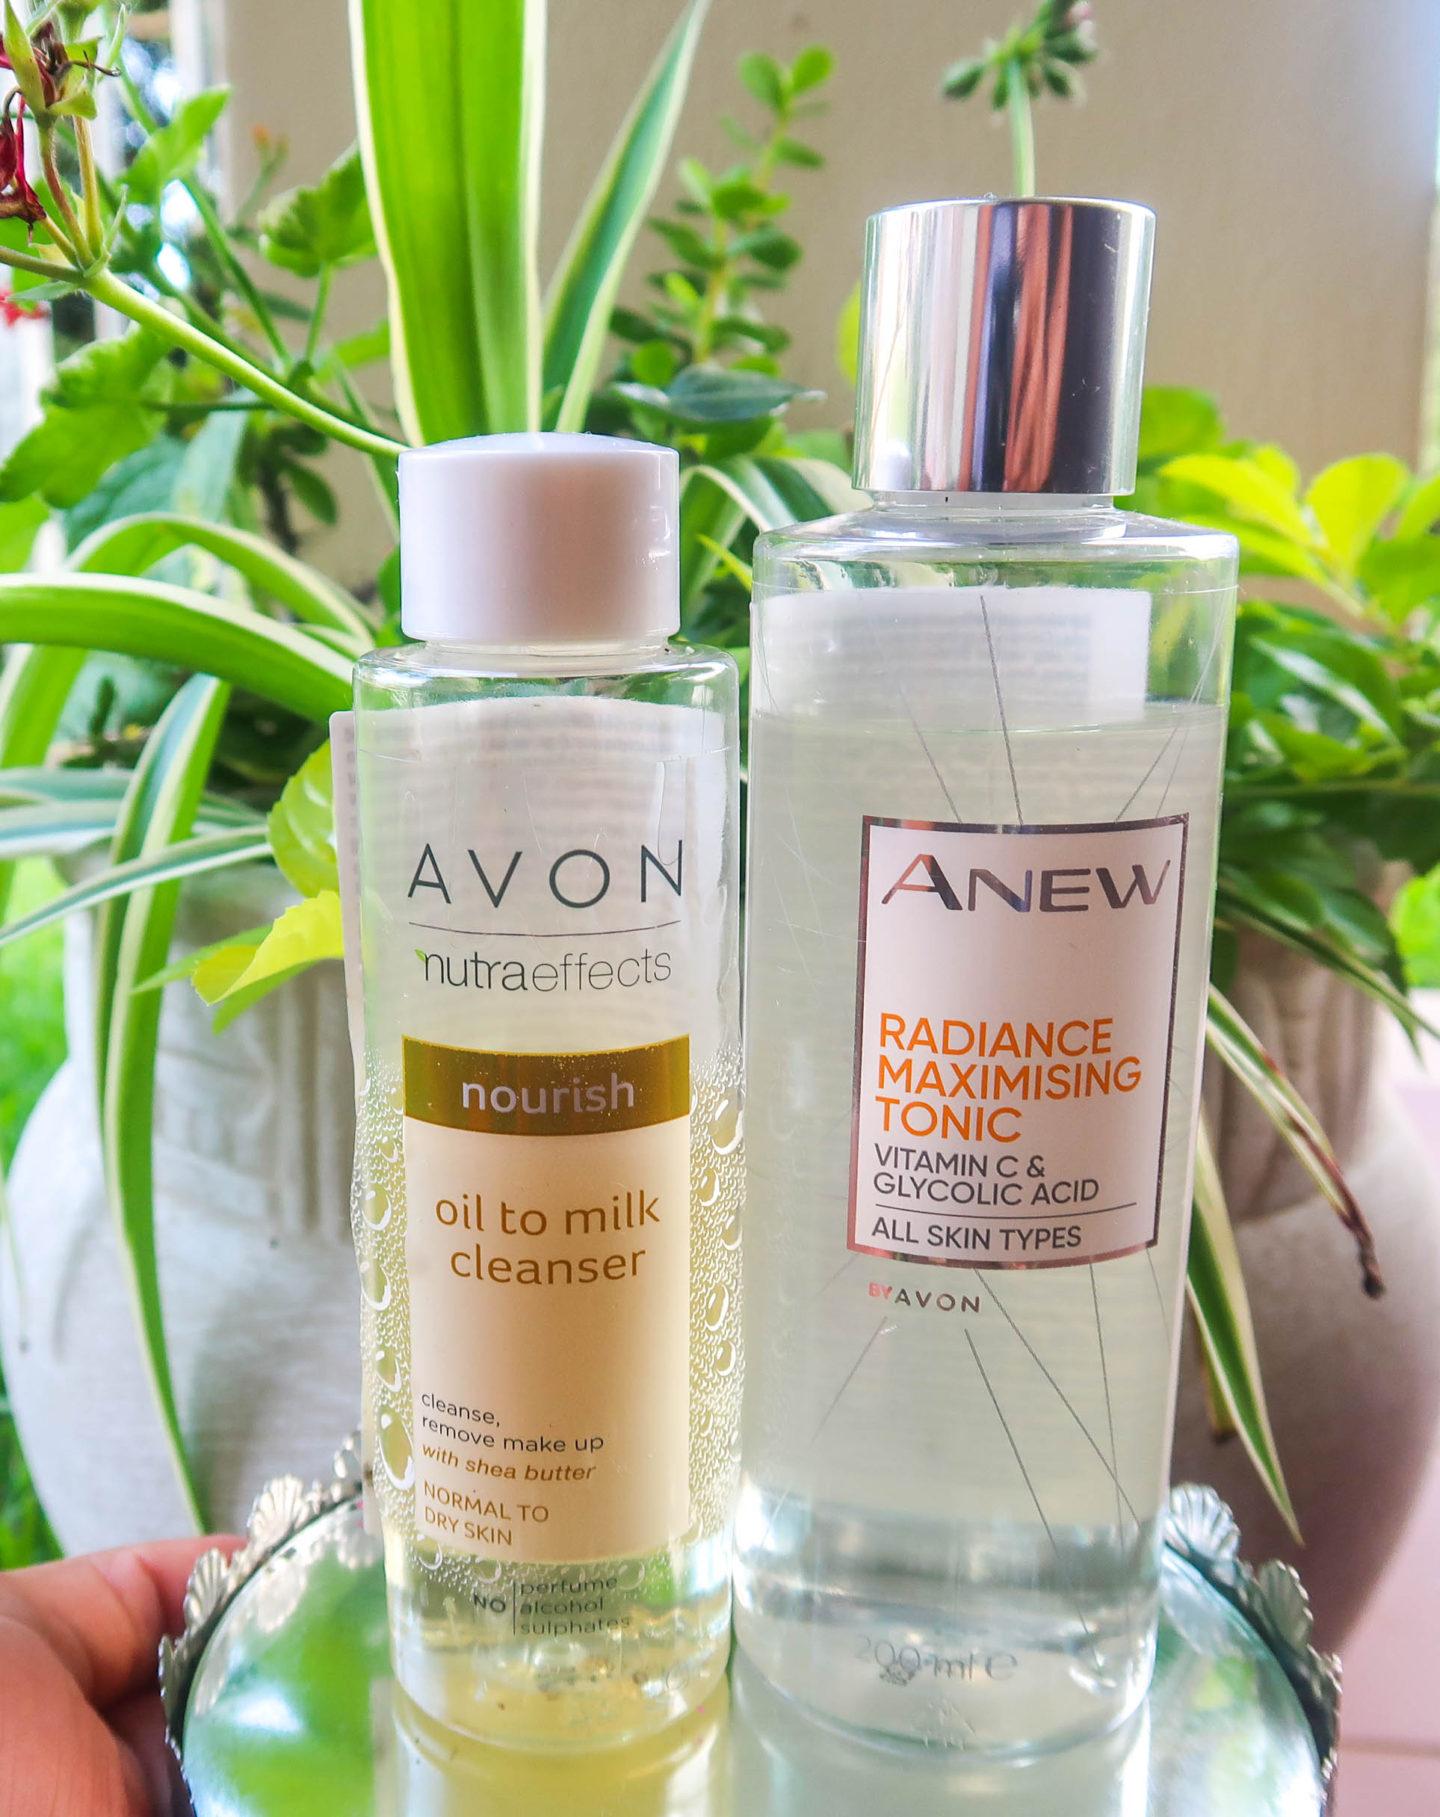 Avon skincare products